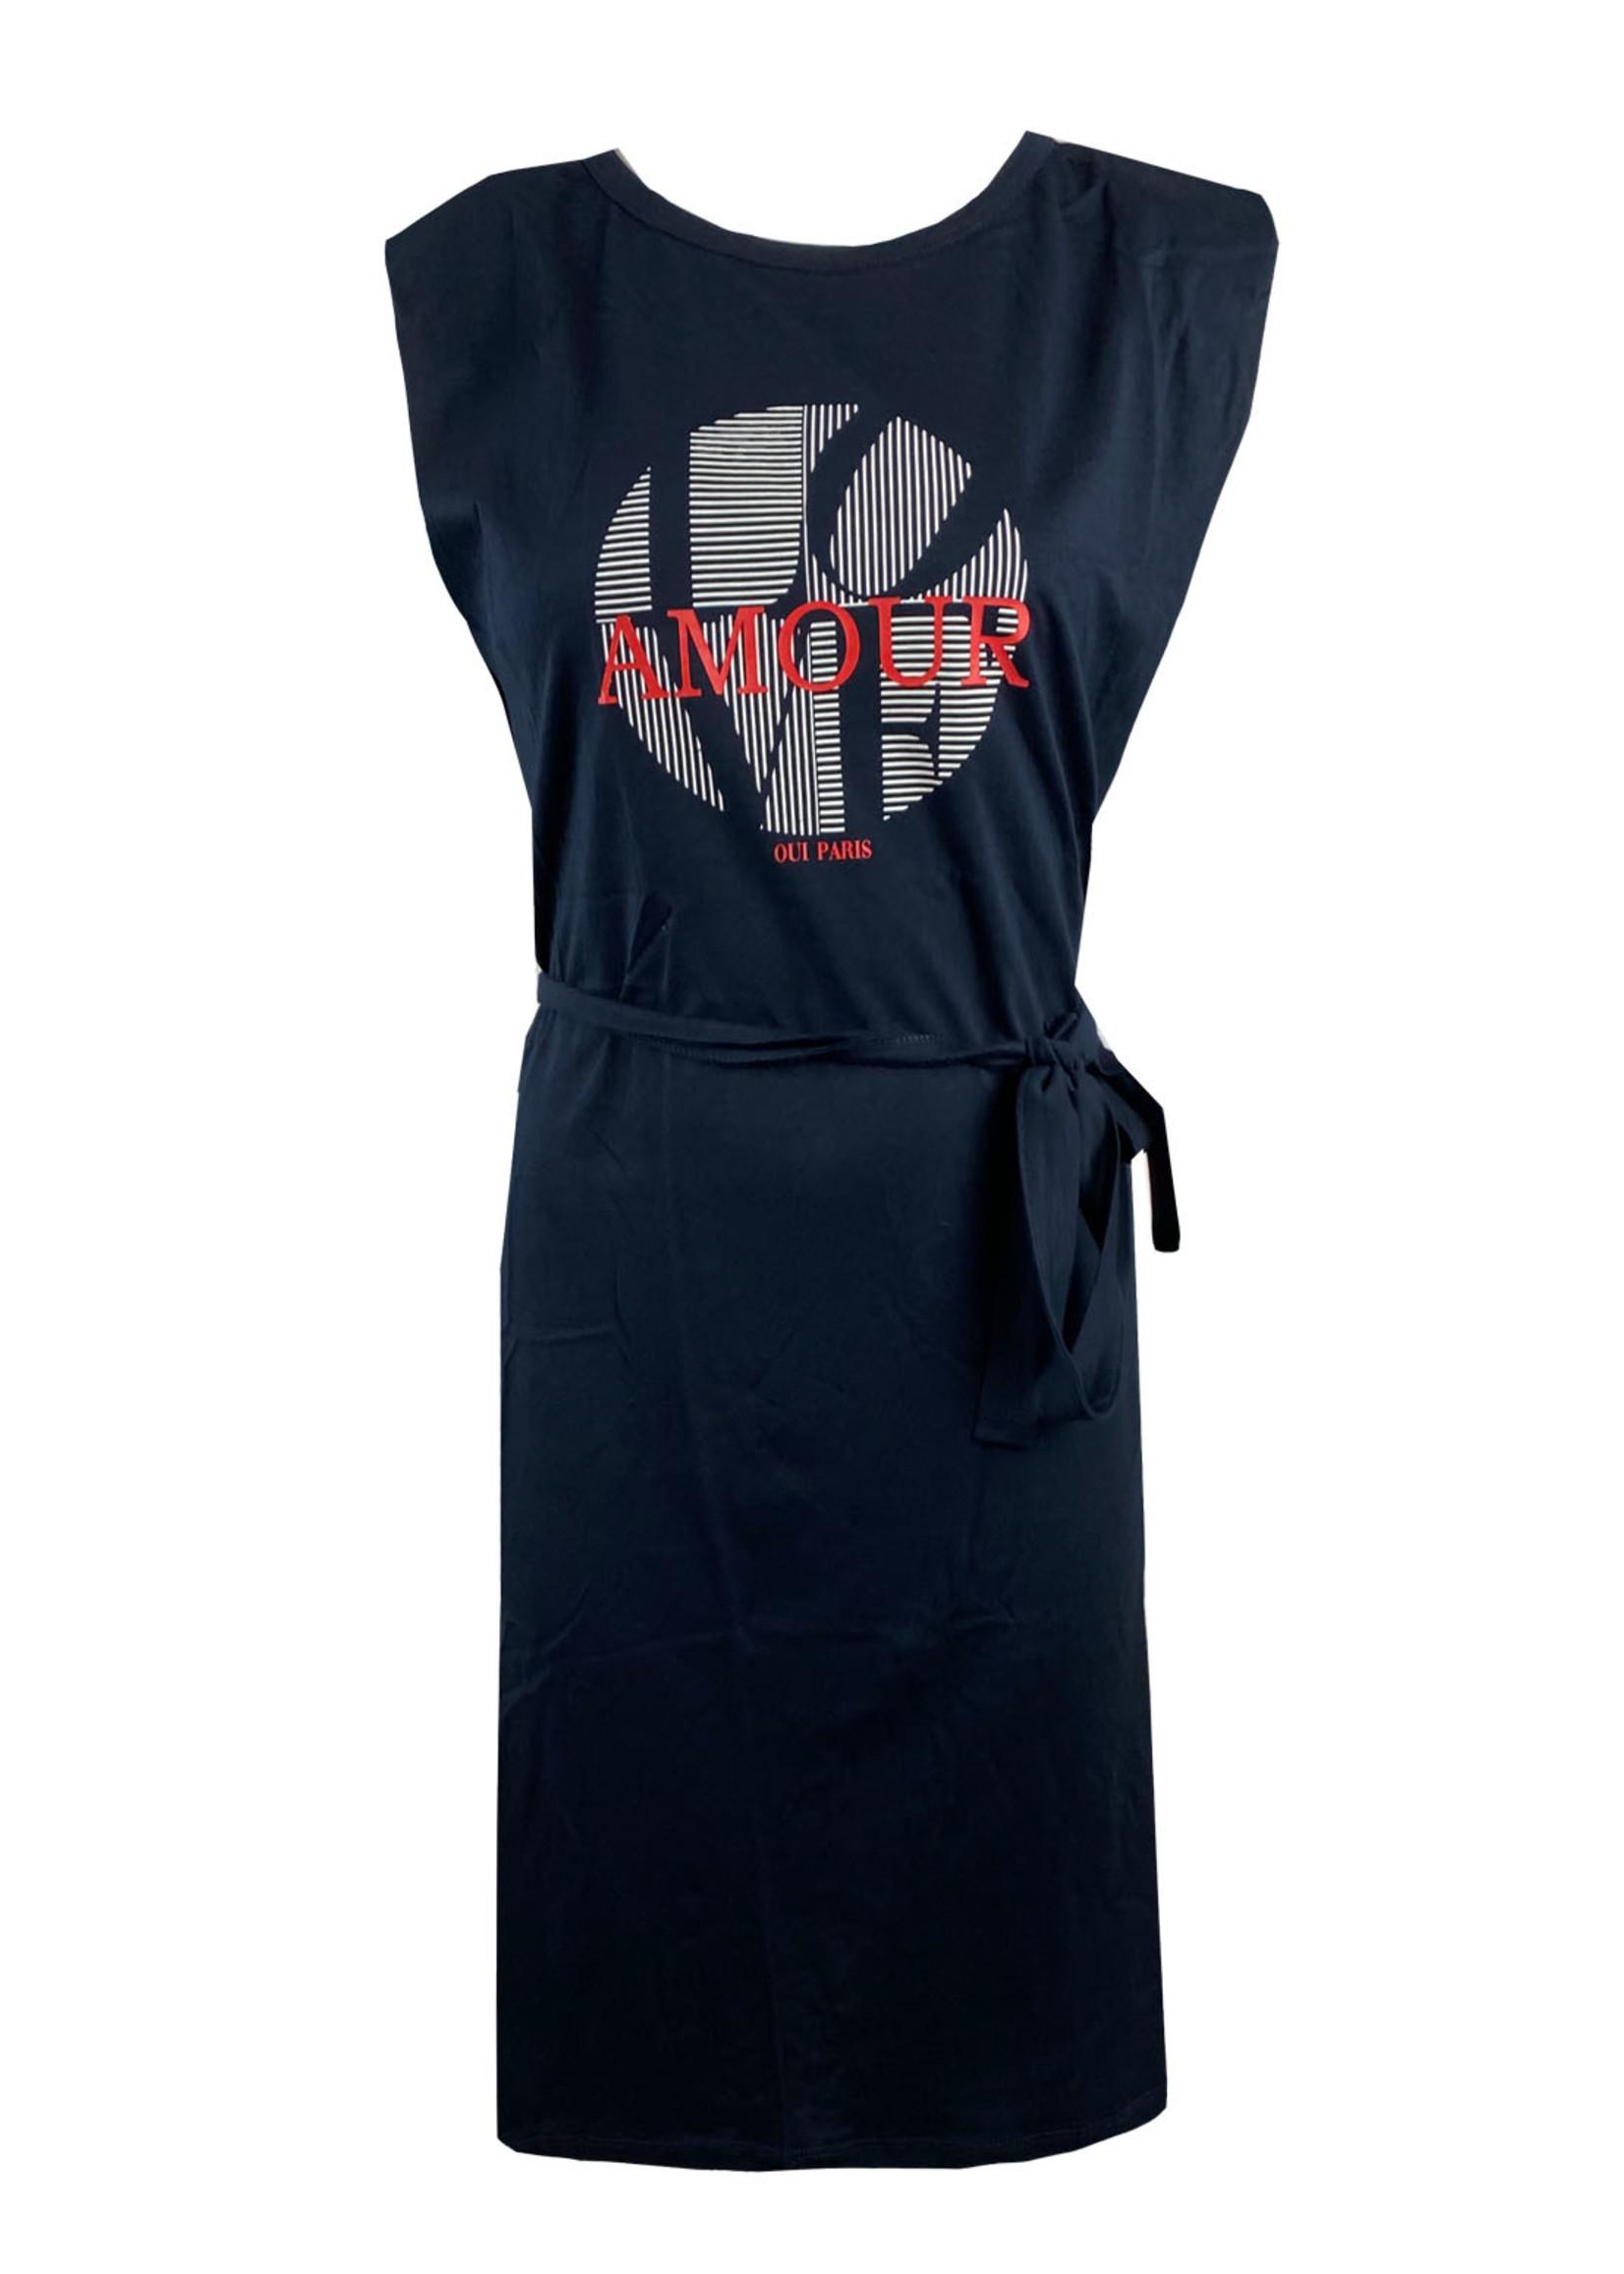 Elvira Collections Elvira Collections Amour Dress